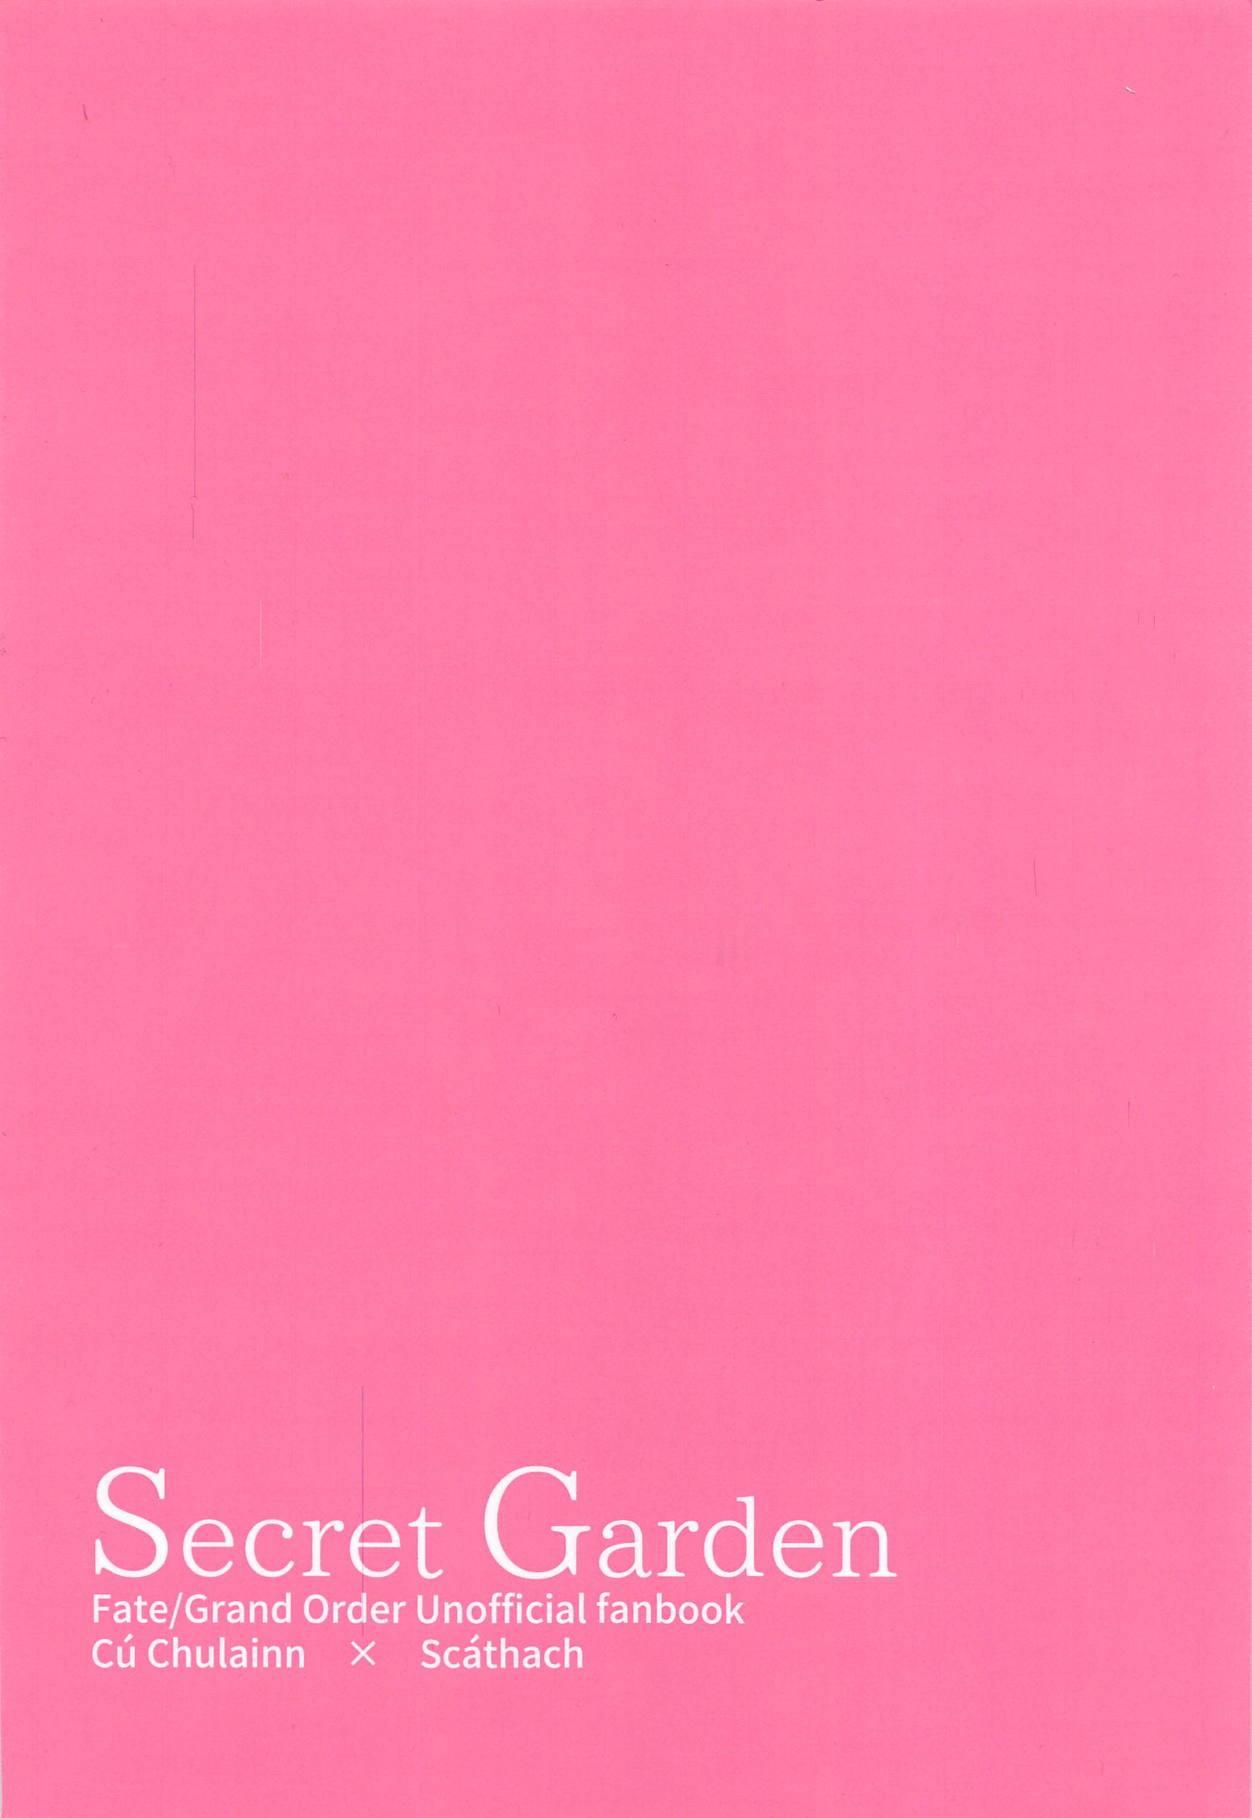 Secret Garden 28